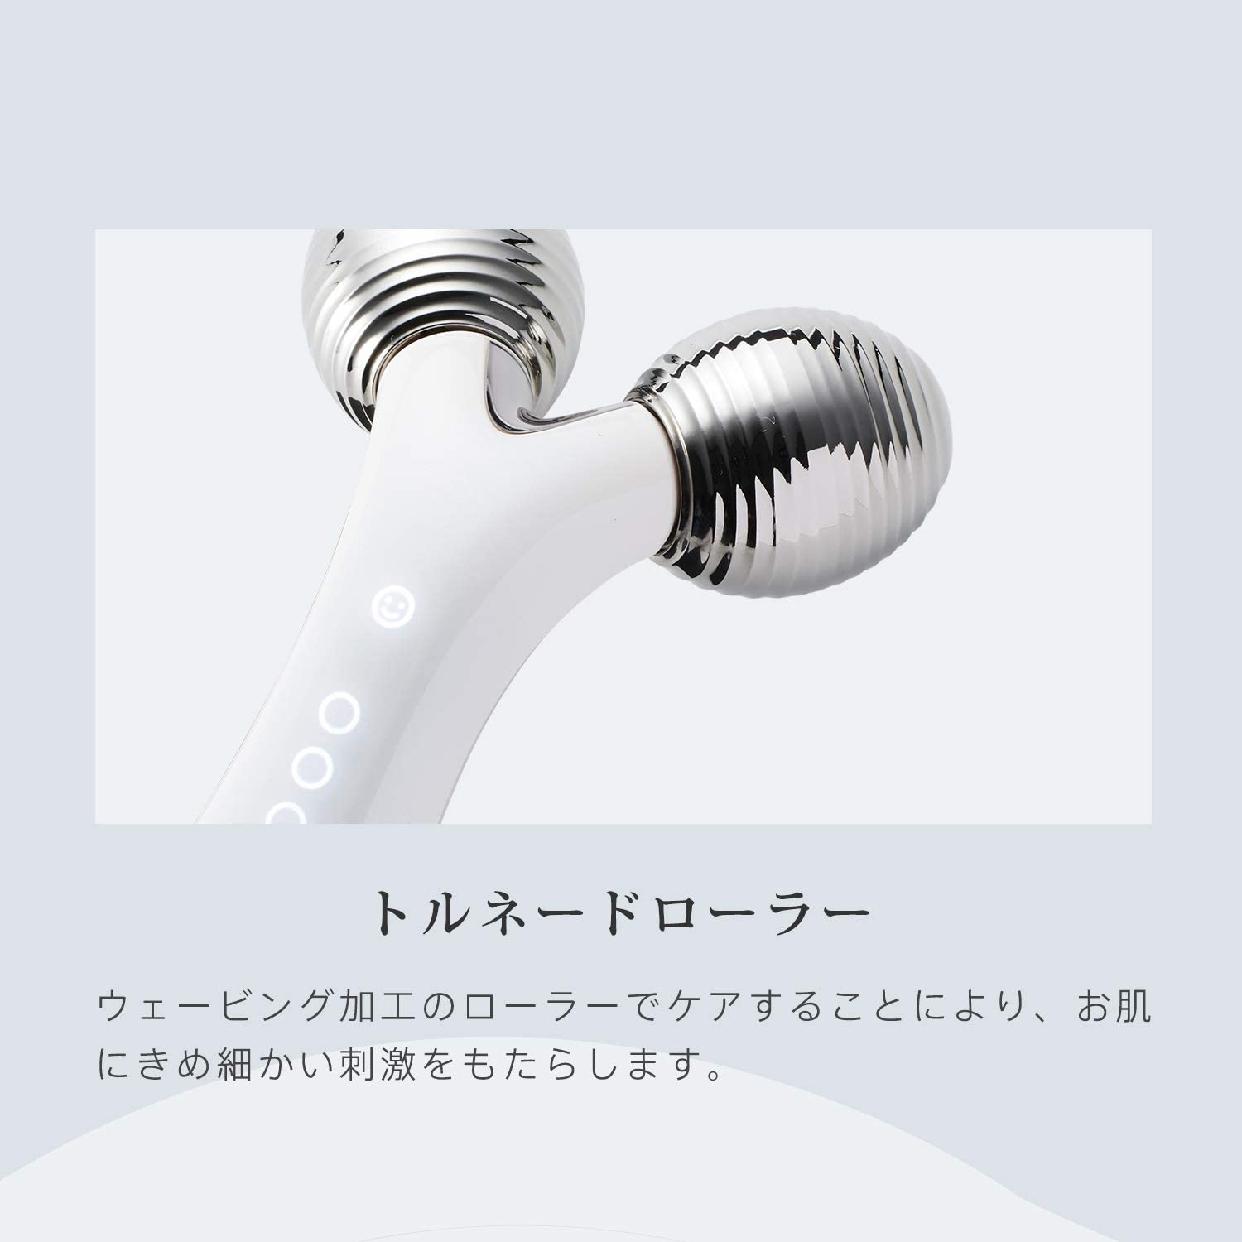 YA-MAN(ヤーマン) WAVY miniの商品画像10